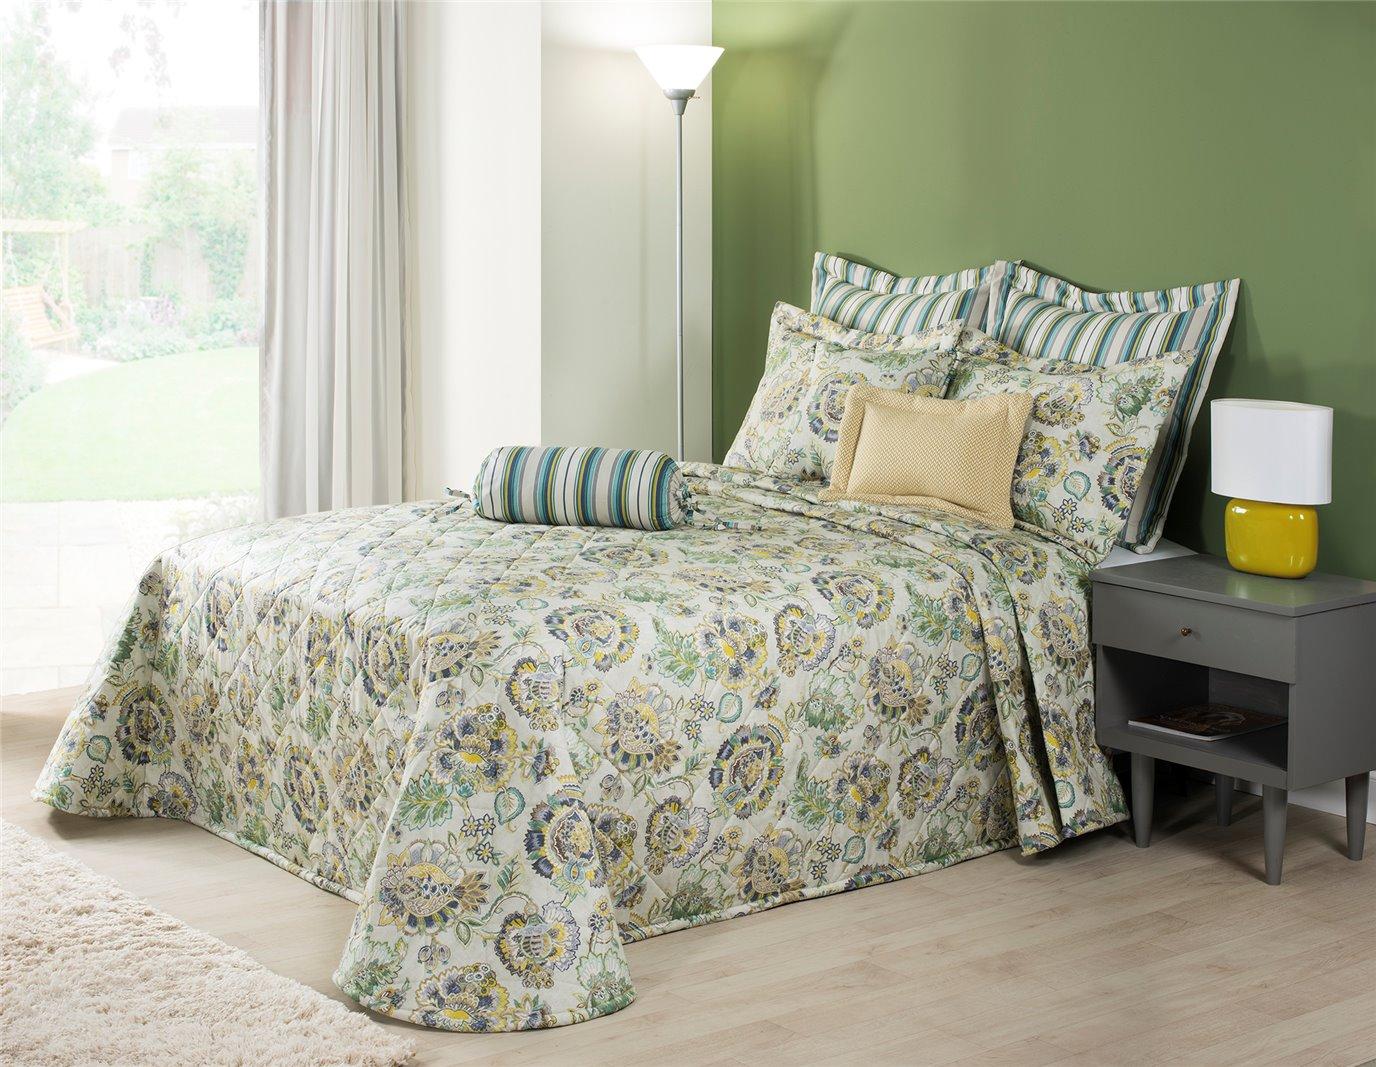 Bedspreads.Riverpark Full Bedspread